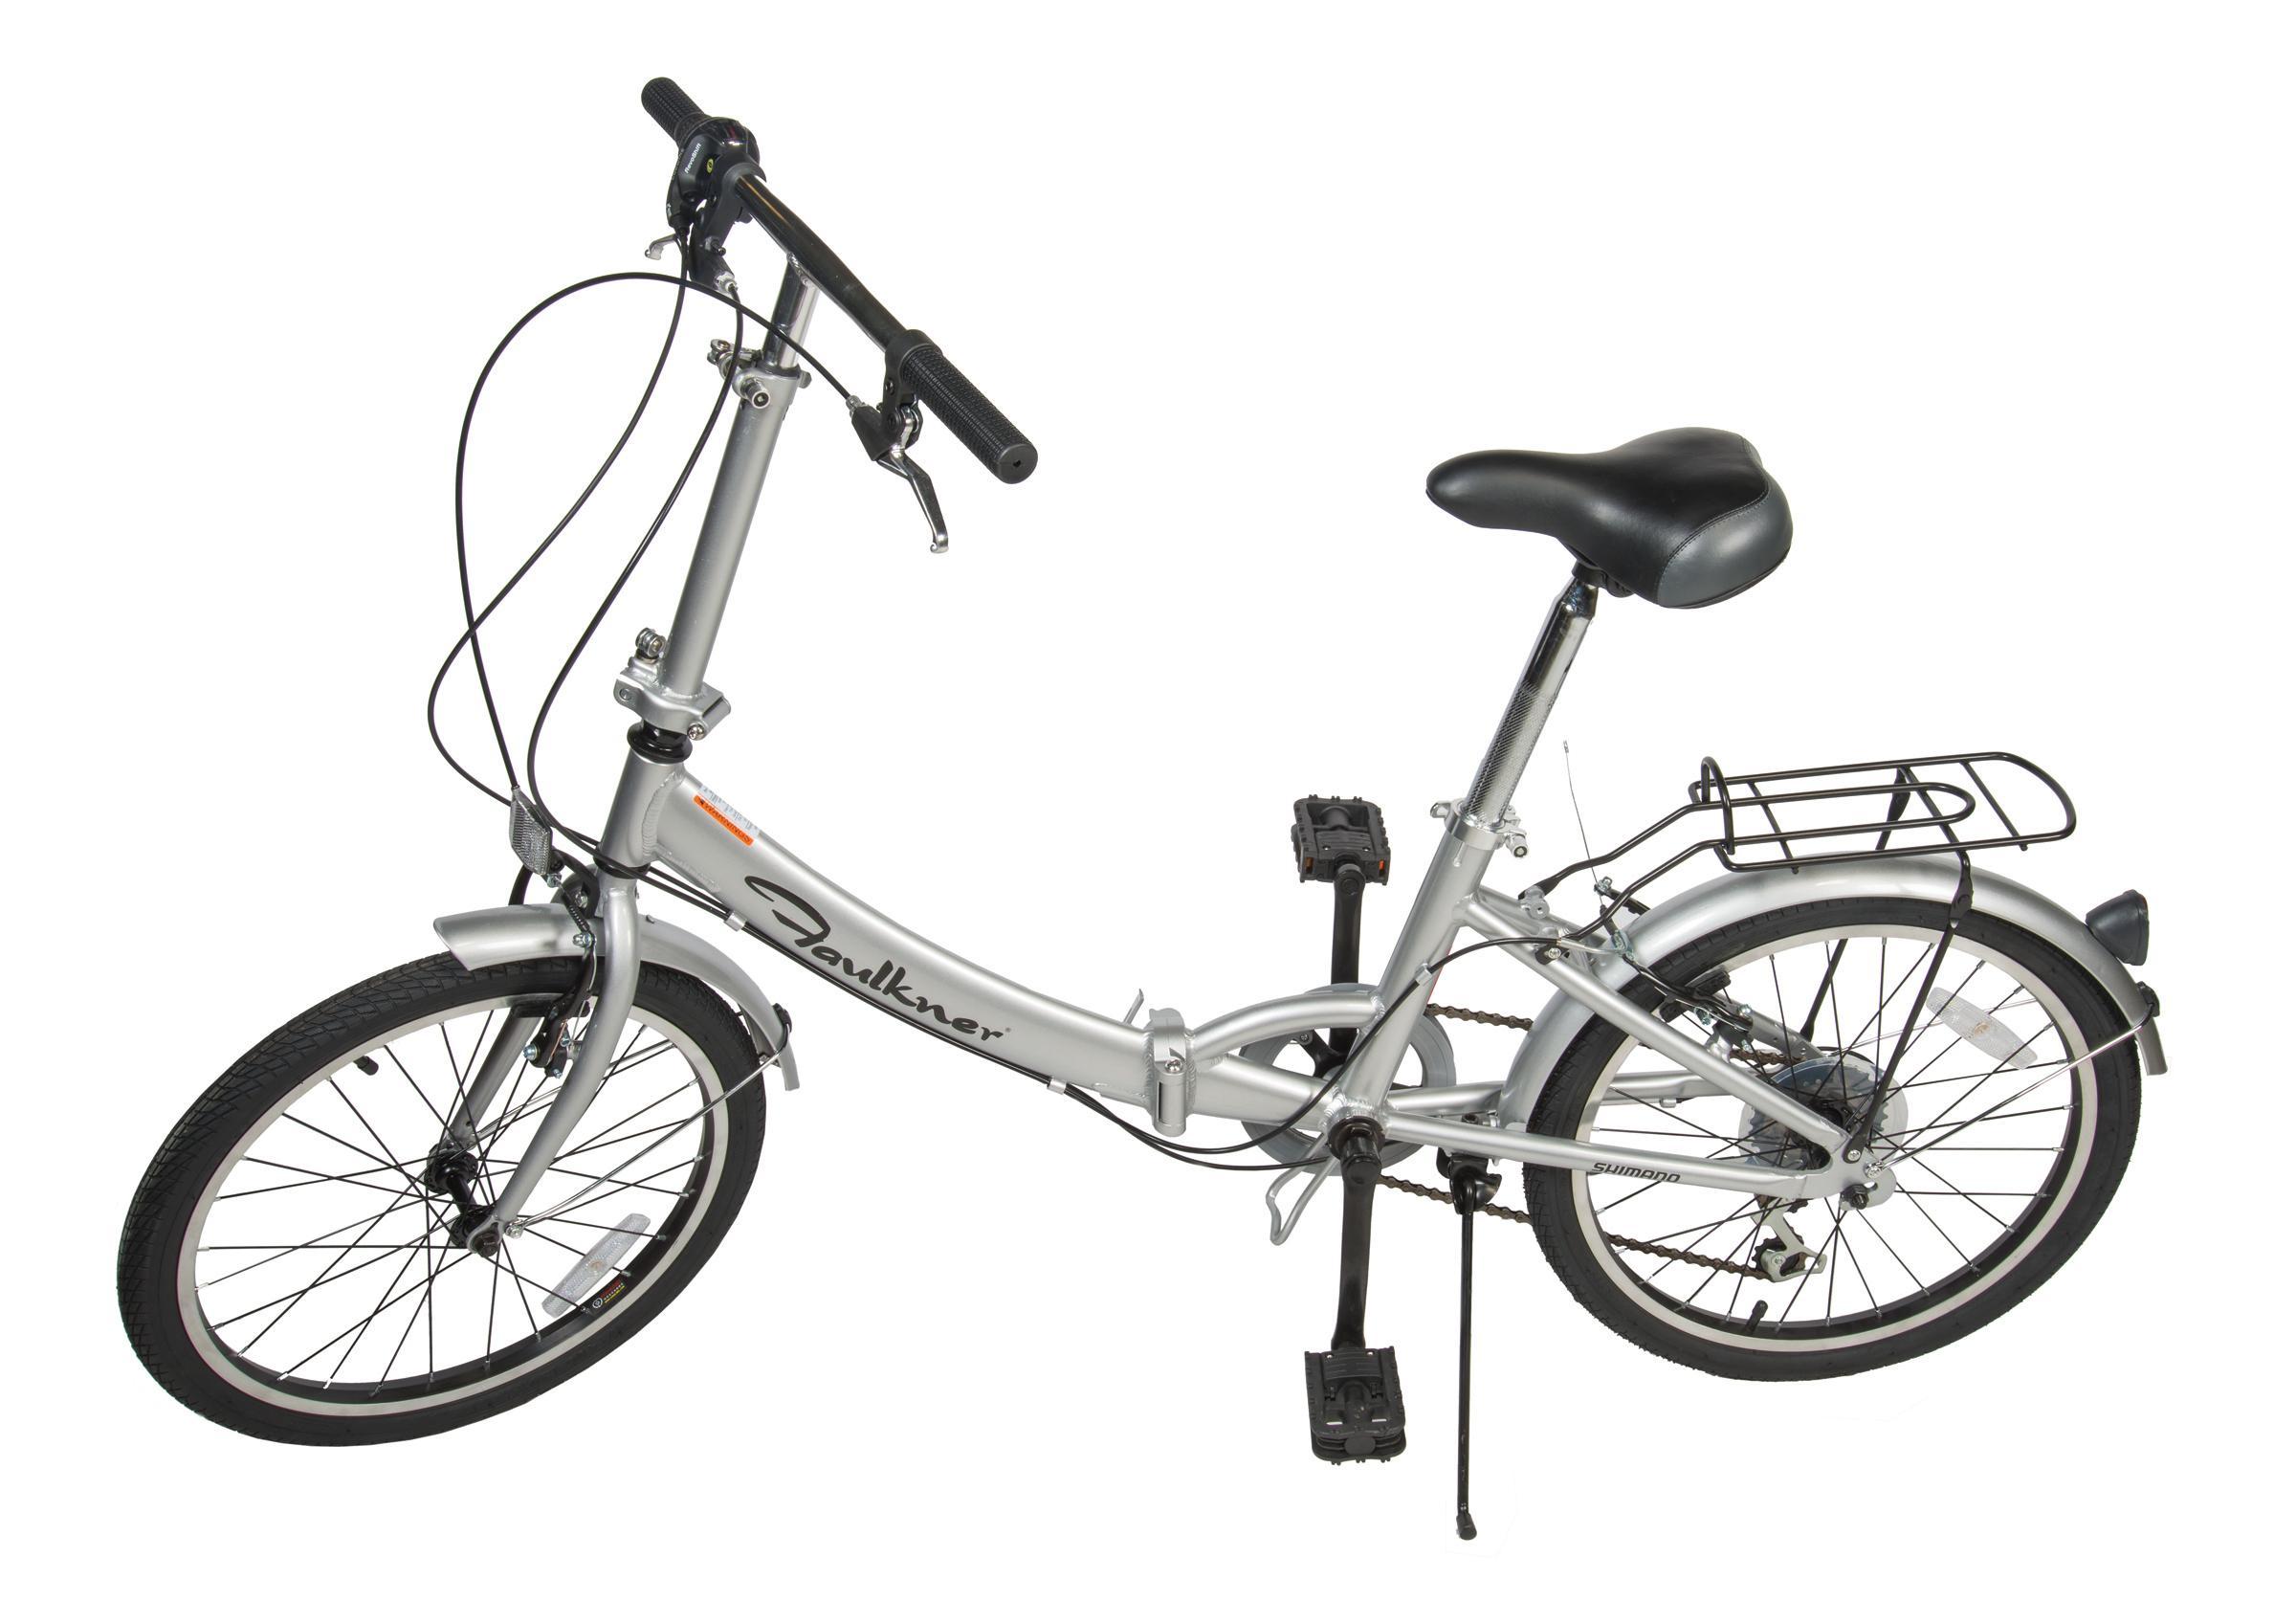 Faulkner Wl 2015a 6 Speed Folding Pedal Bike 20 Inch